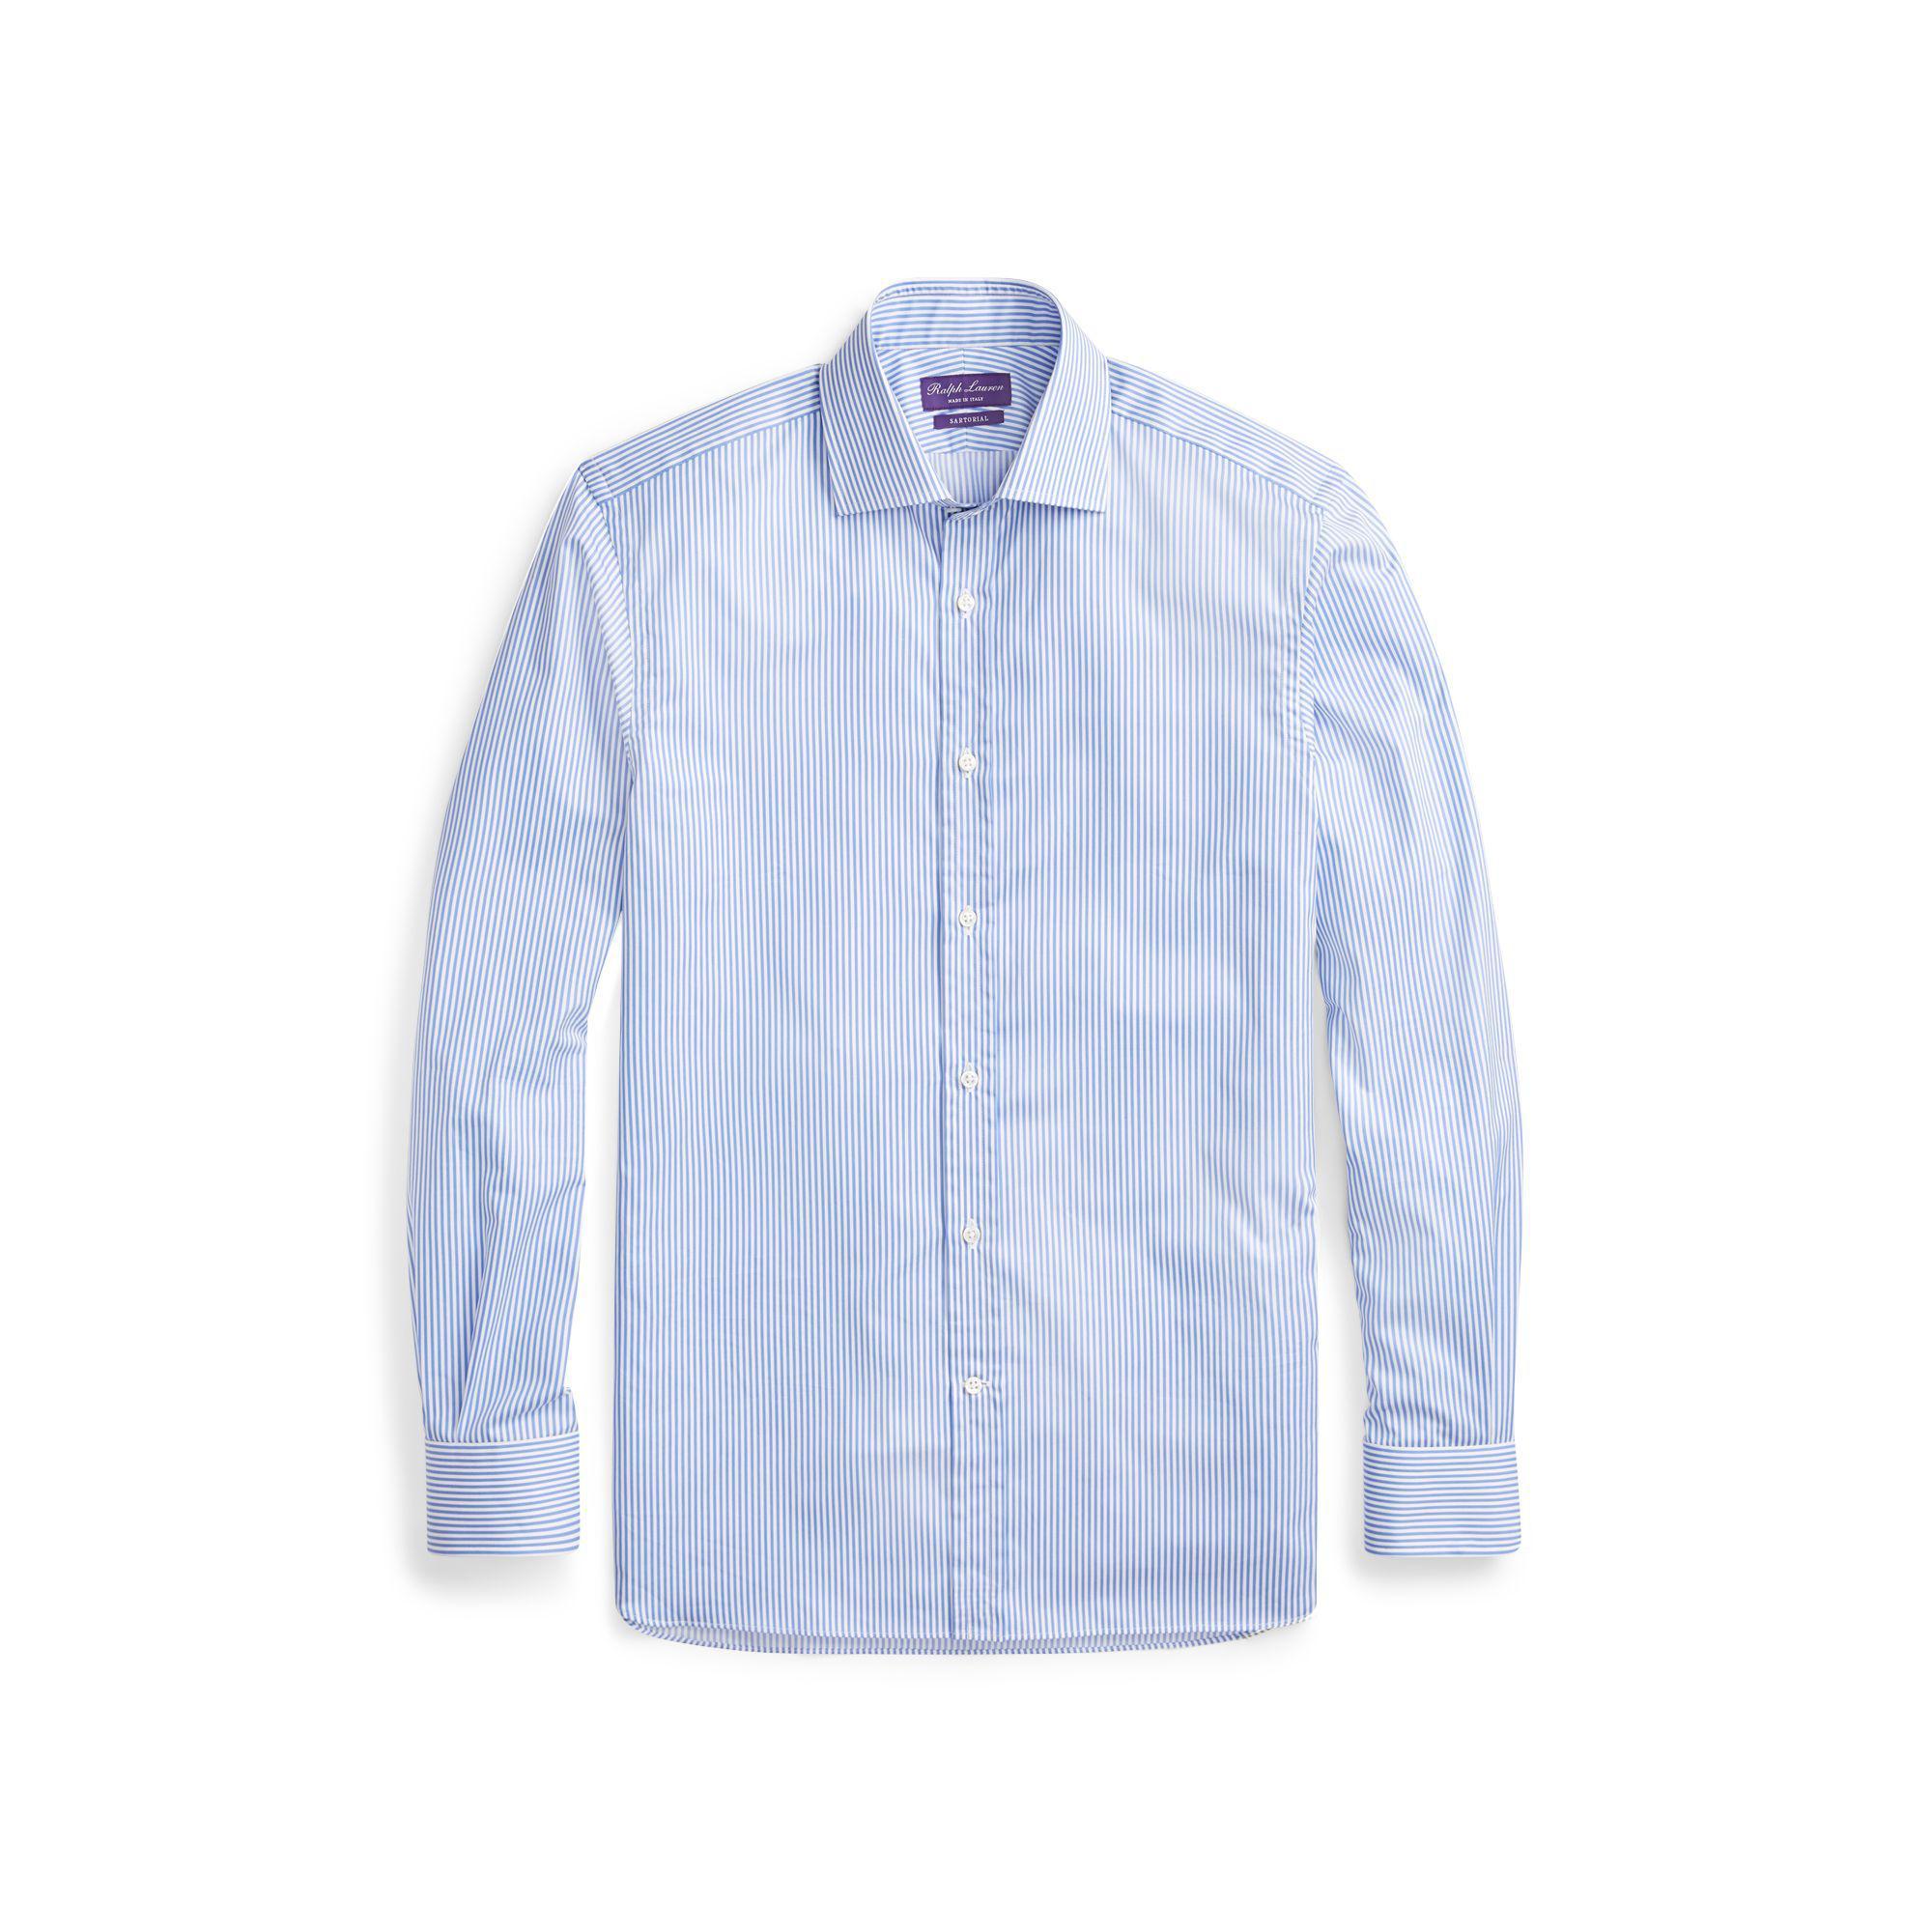 64d05096 Lyst - Ralph Lauren Purple Label Bengal-striped Twill Shirt in Blue ...